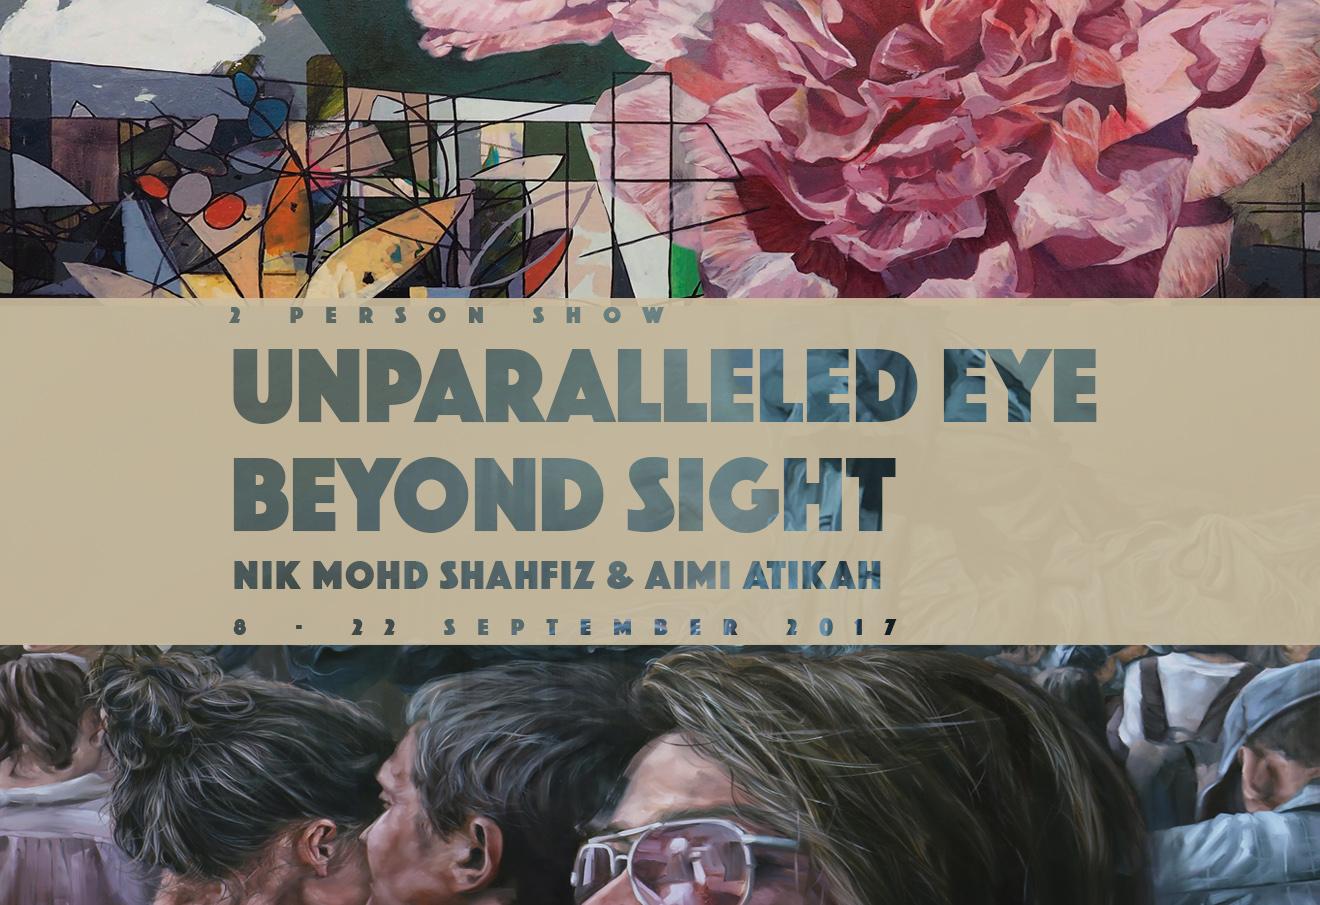 Unparalleled Eye Beyond Sight